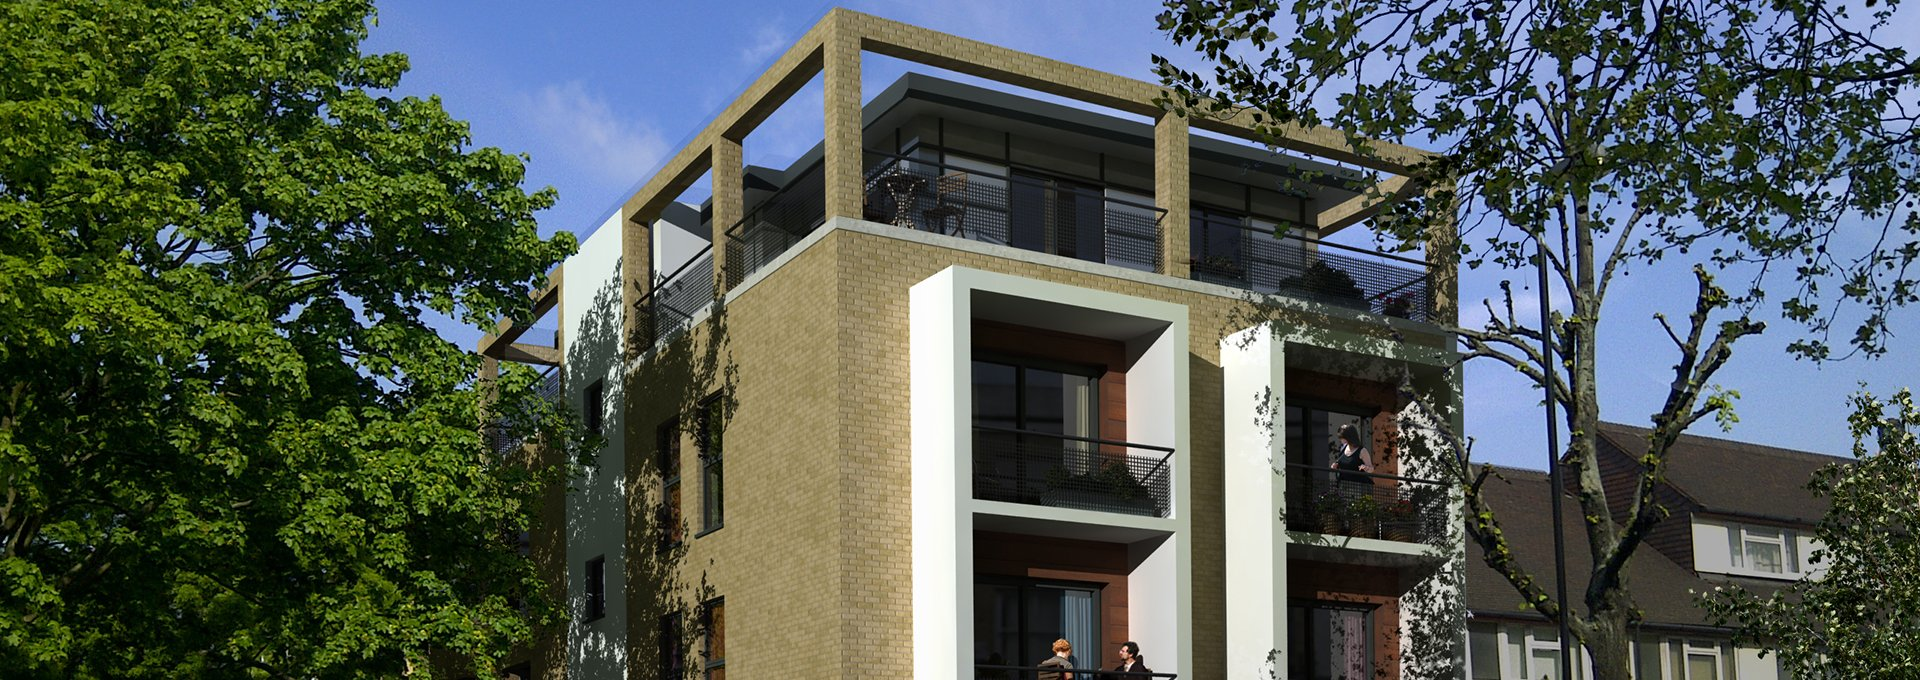 Architecture | Dunton Road Wimbledon